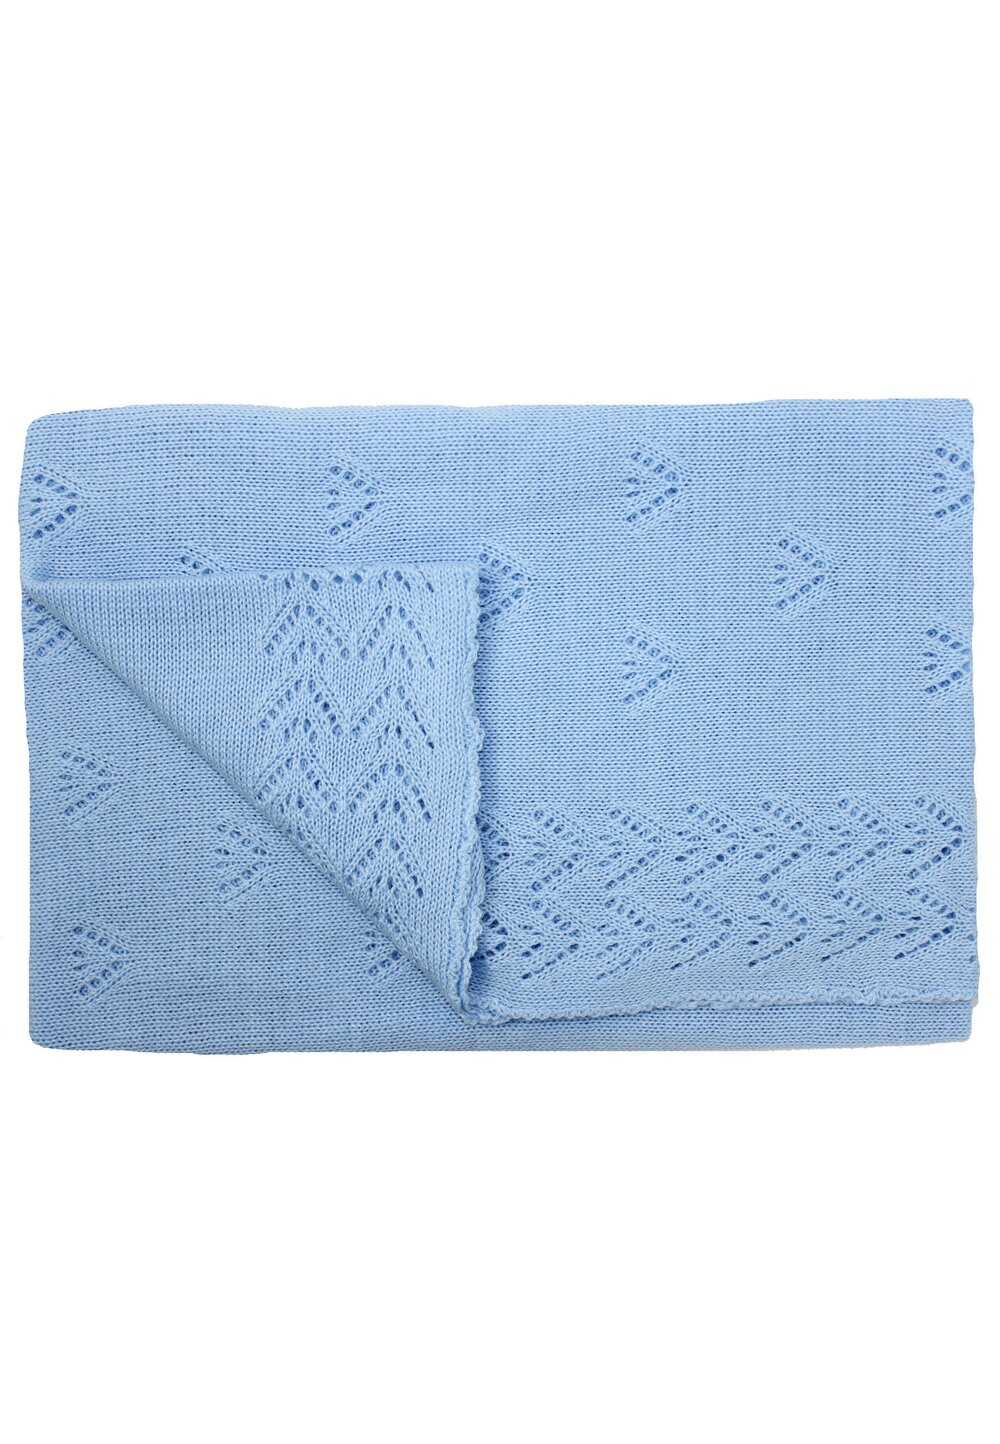 Paturica tricotata, Ana, albastra, 90x90cm imagine